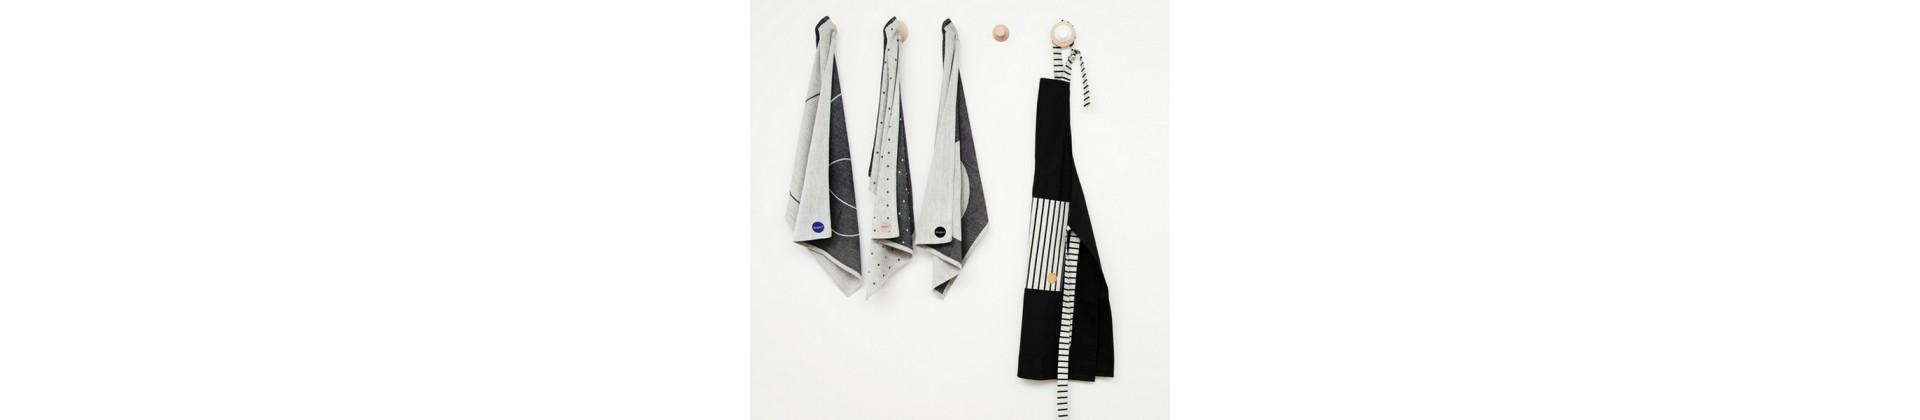 Kitchen&dining textiles